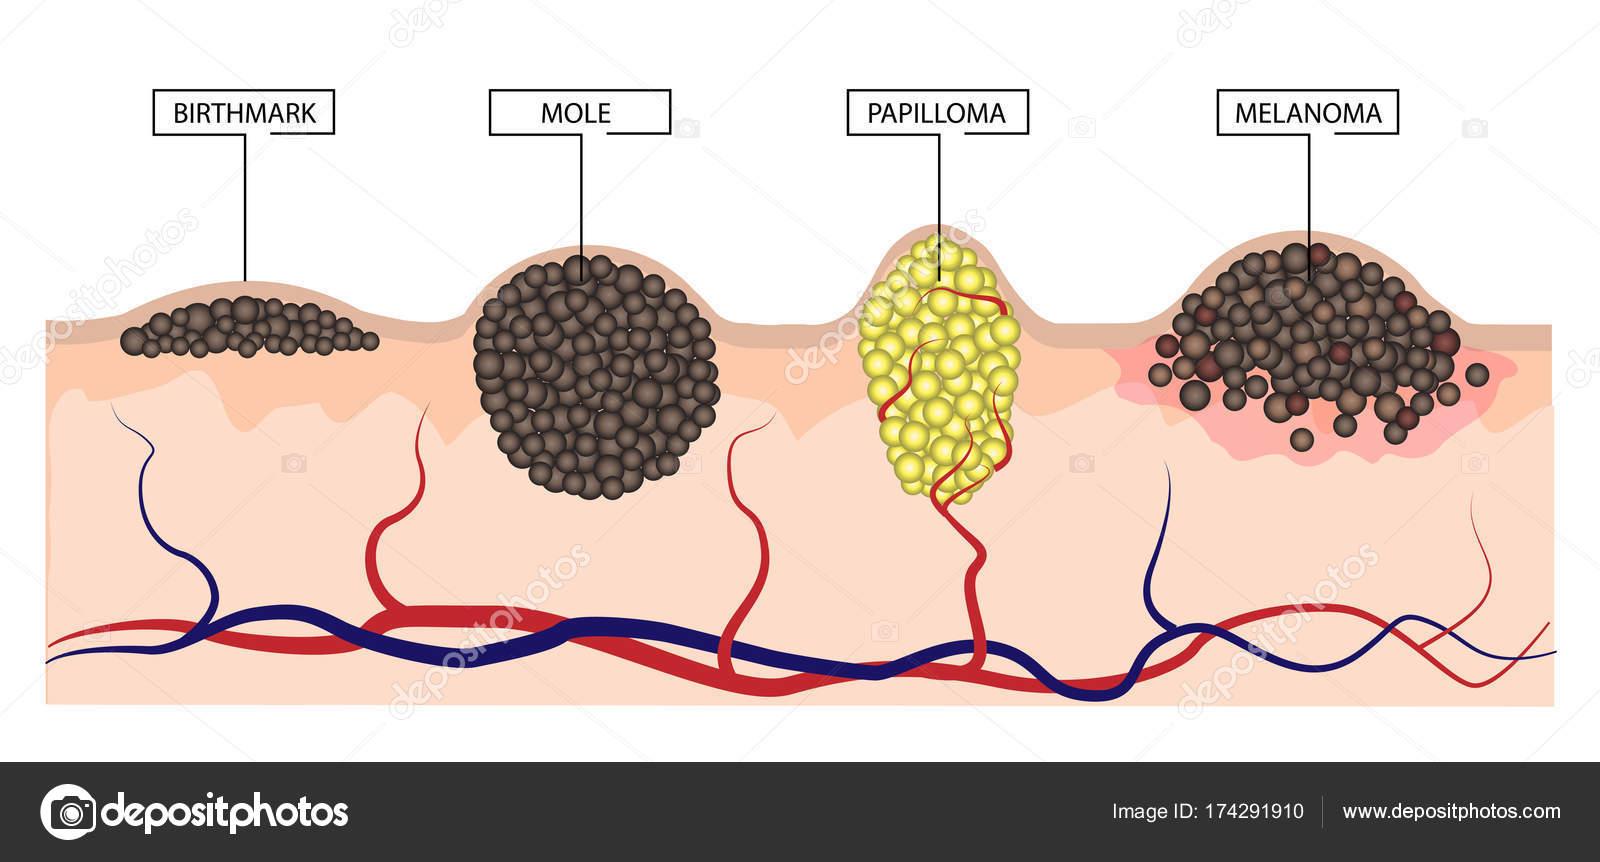 papilloma and moles